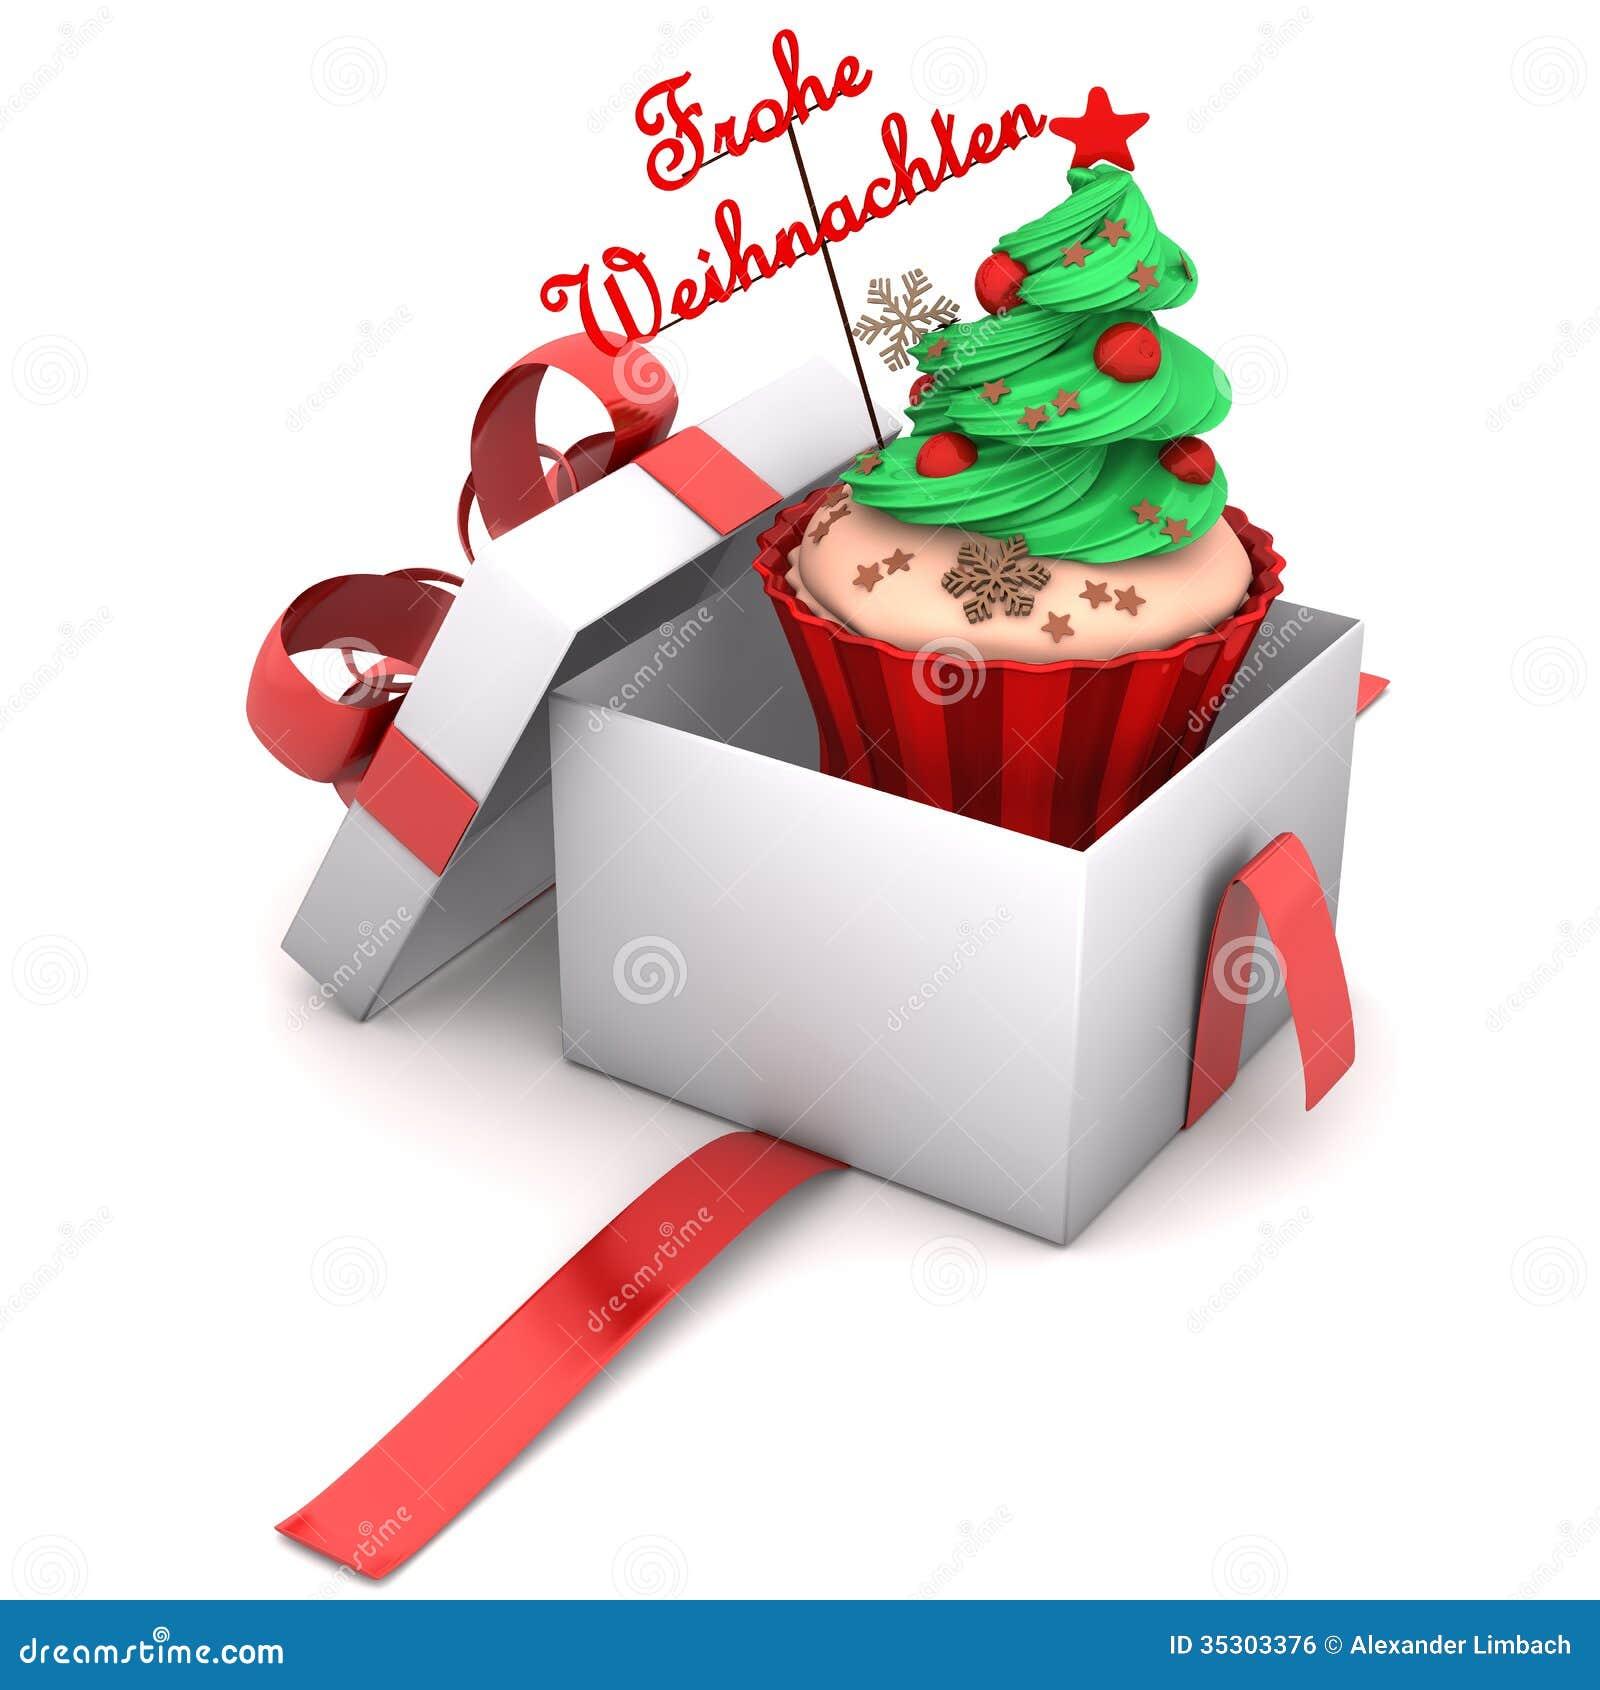 gift cupcake merry christmas stock illustration. Black Bedroom Furniture Sets. Home Design Ideas